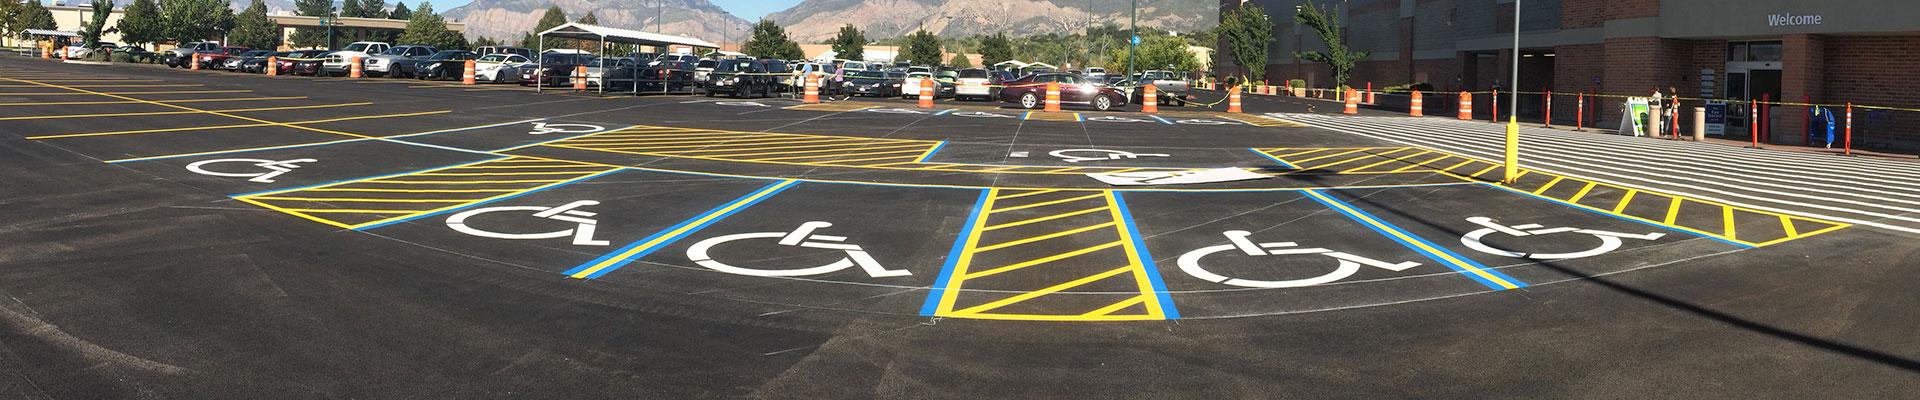 rotator-parking-stalls